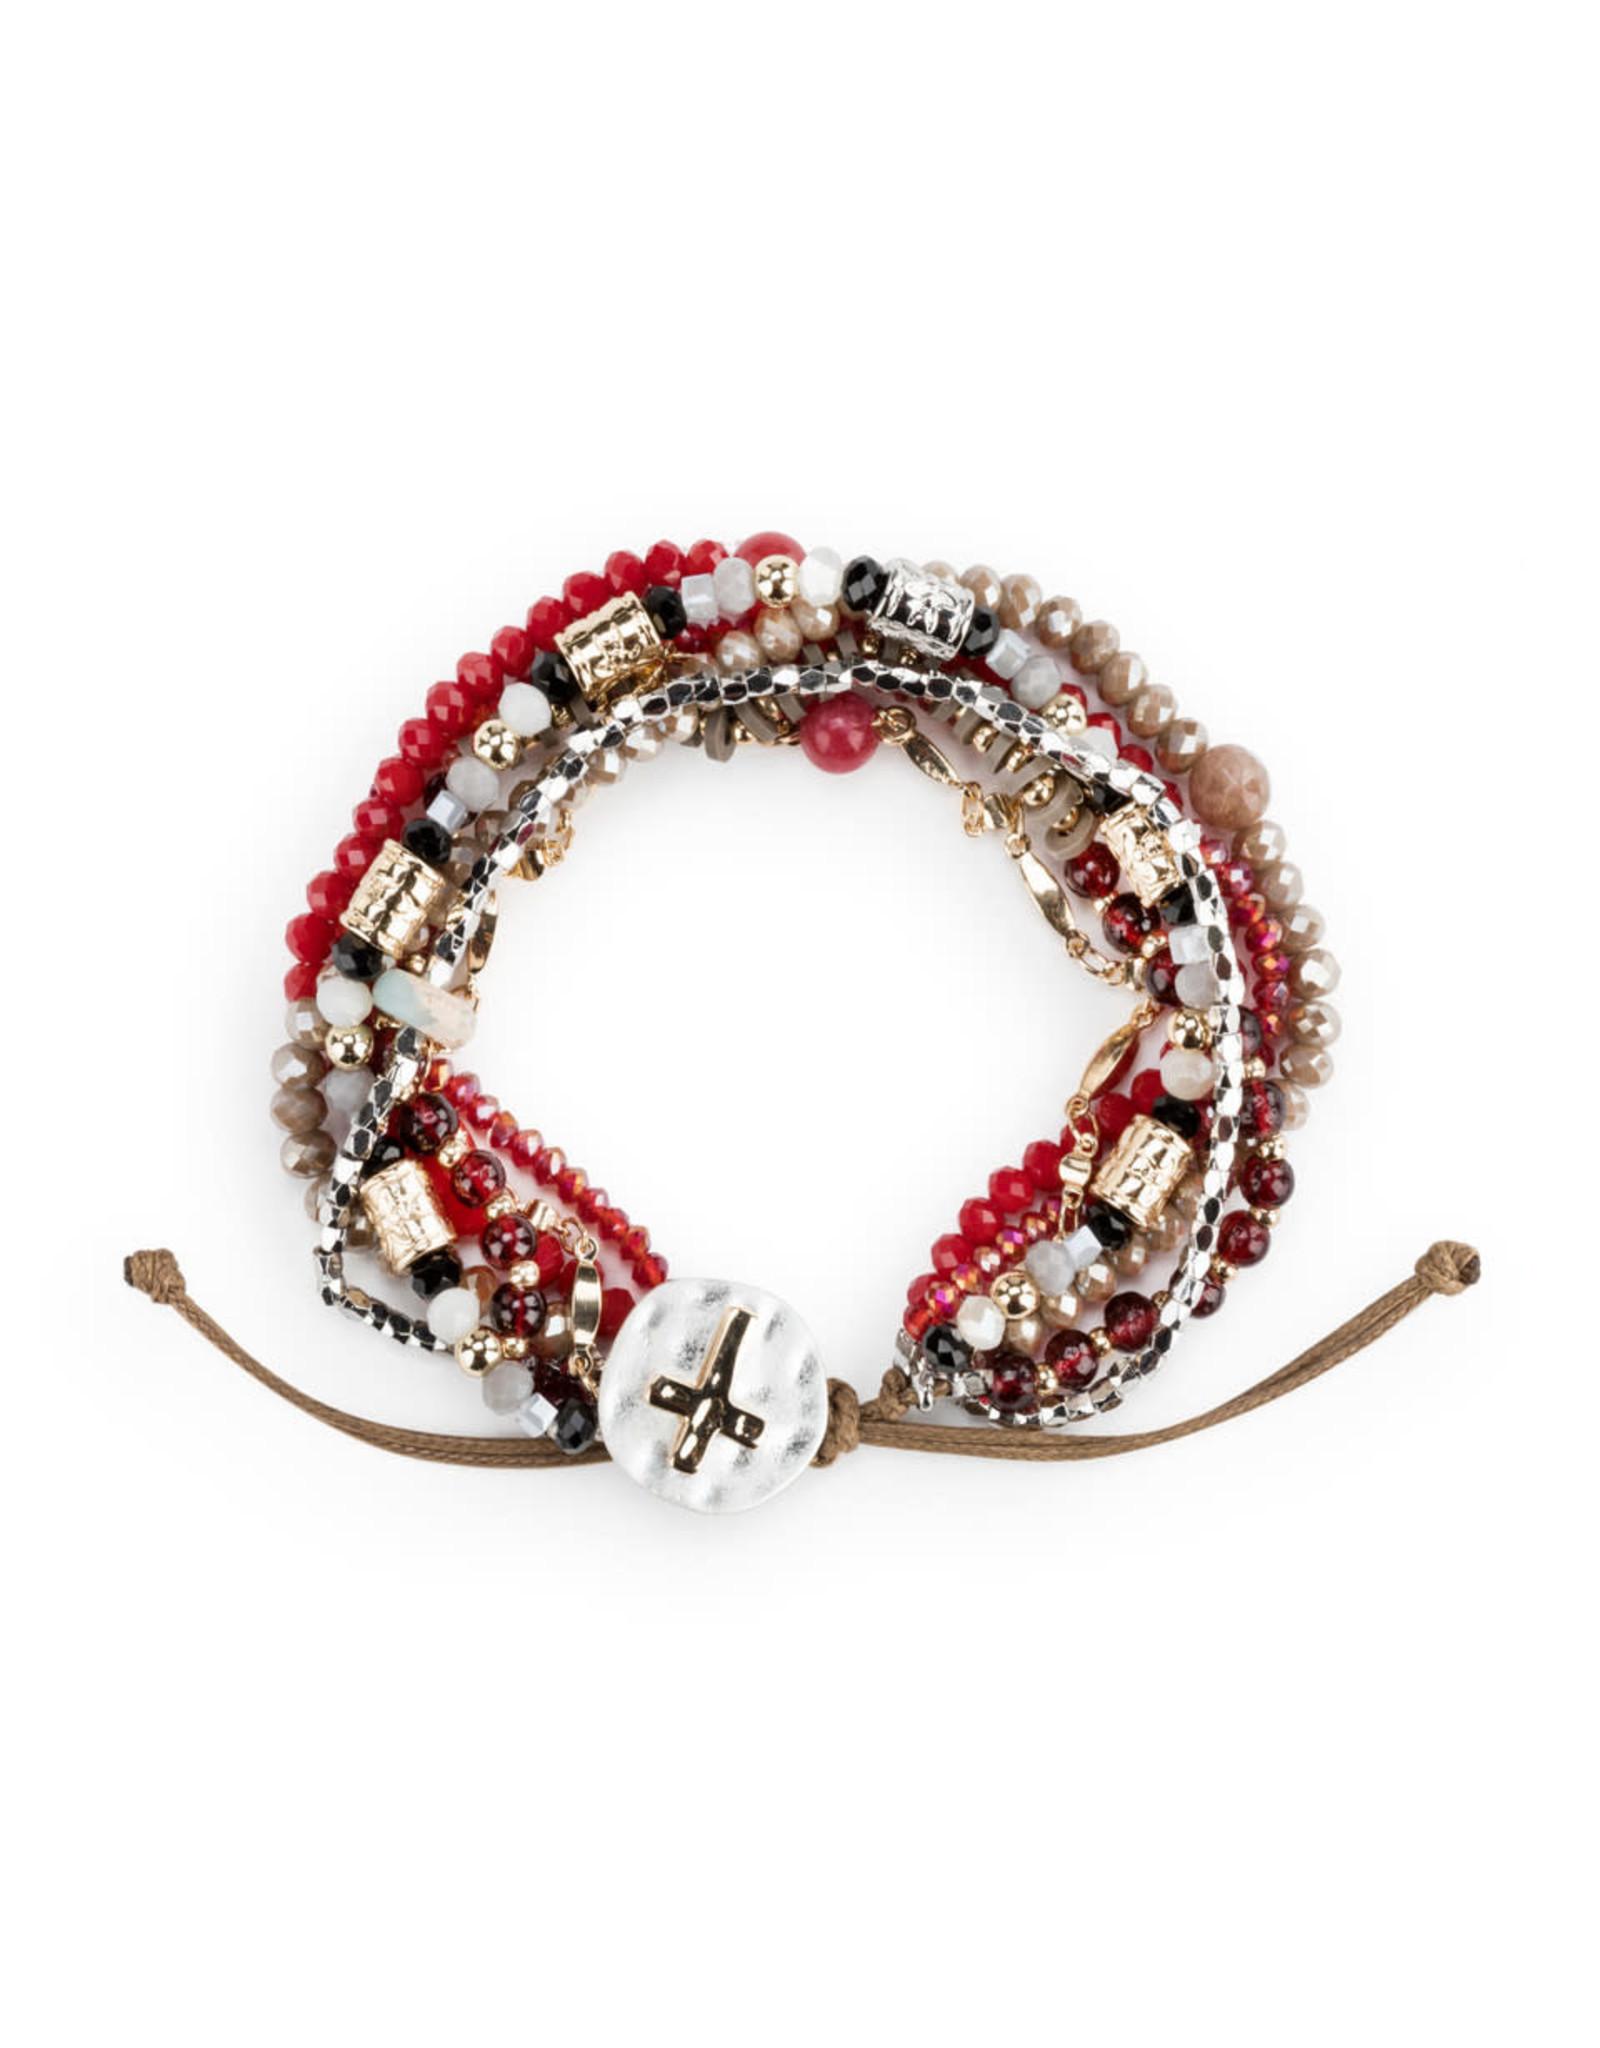 Your Journey Prayer Bracelet in Garnet Red